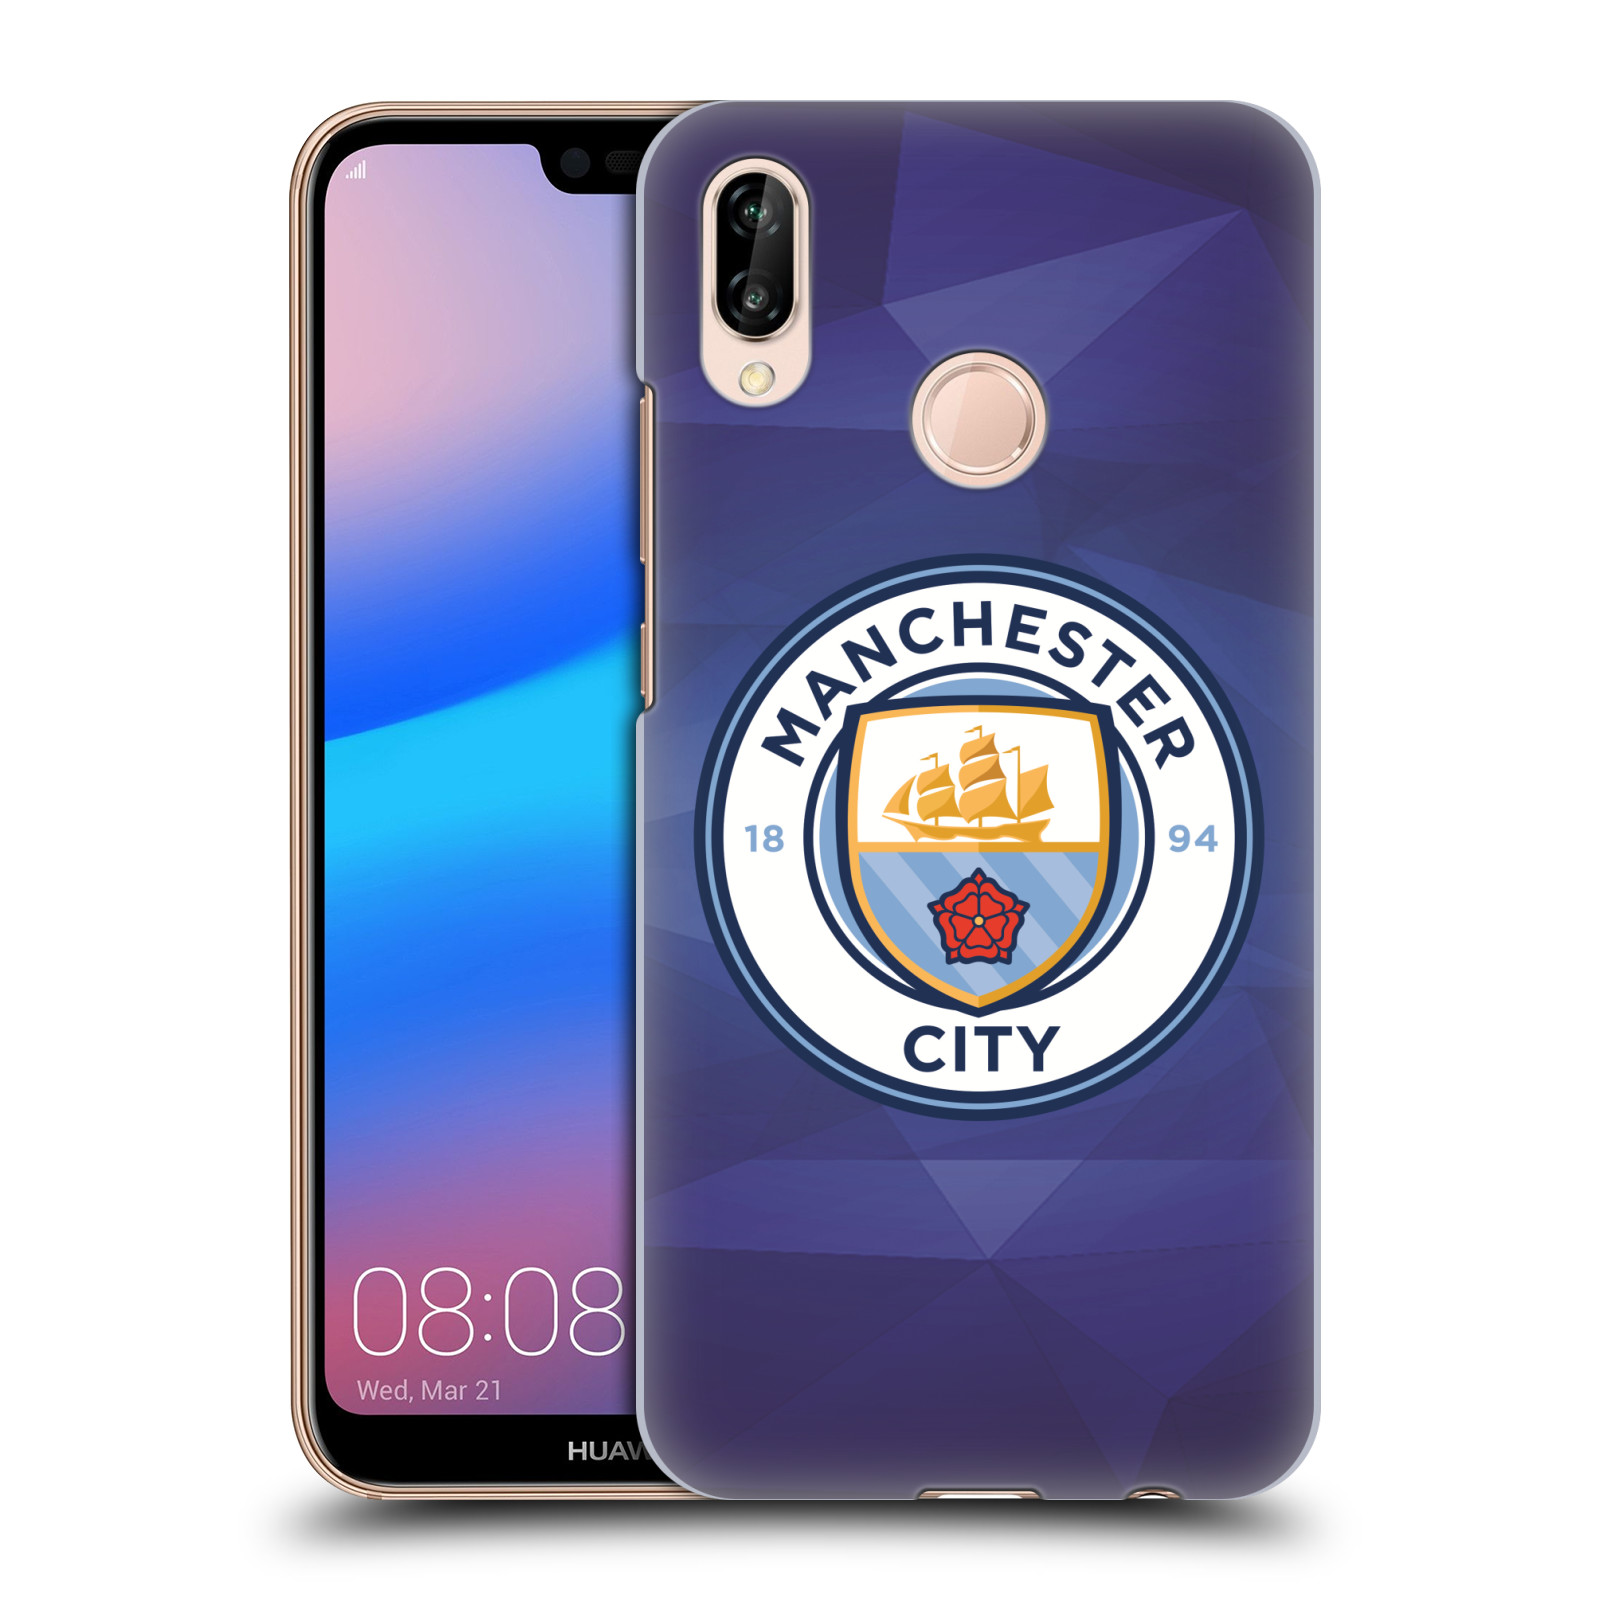 Plastové pouzdro na mobil Huawei P20 Lite - Head Case - Manchester City FC - Modré nové logo